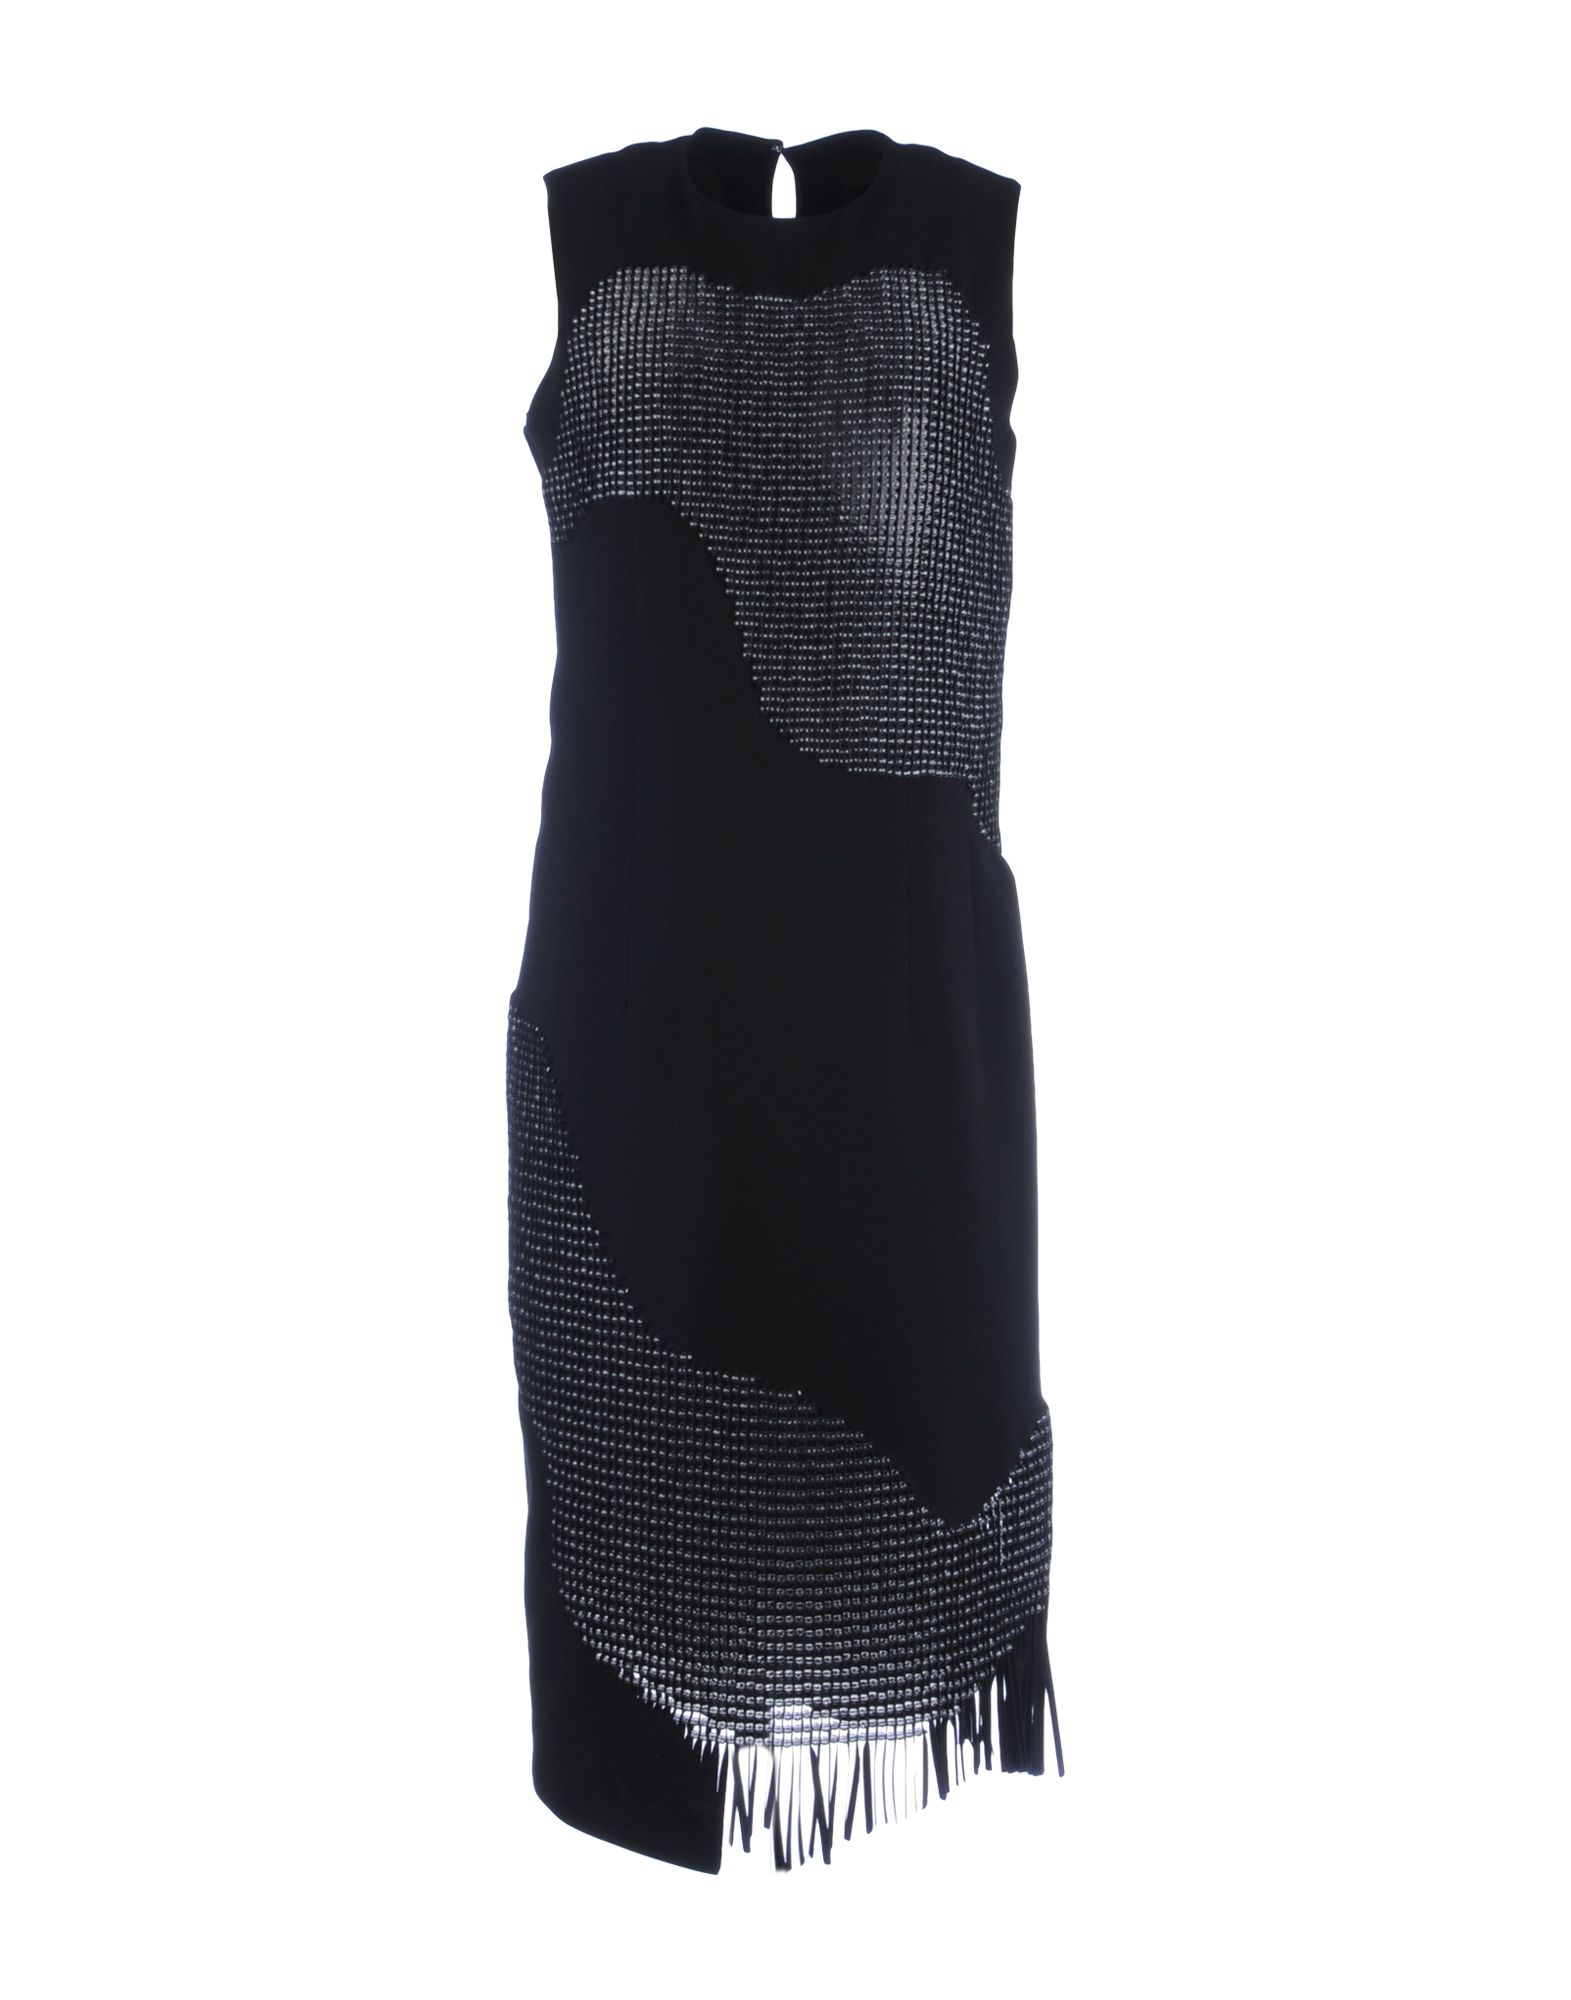 NOIR KEI NINOMIYA Платье длиной 3/4 футболка supremebeing pantera noir ss14 black 8901 xl